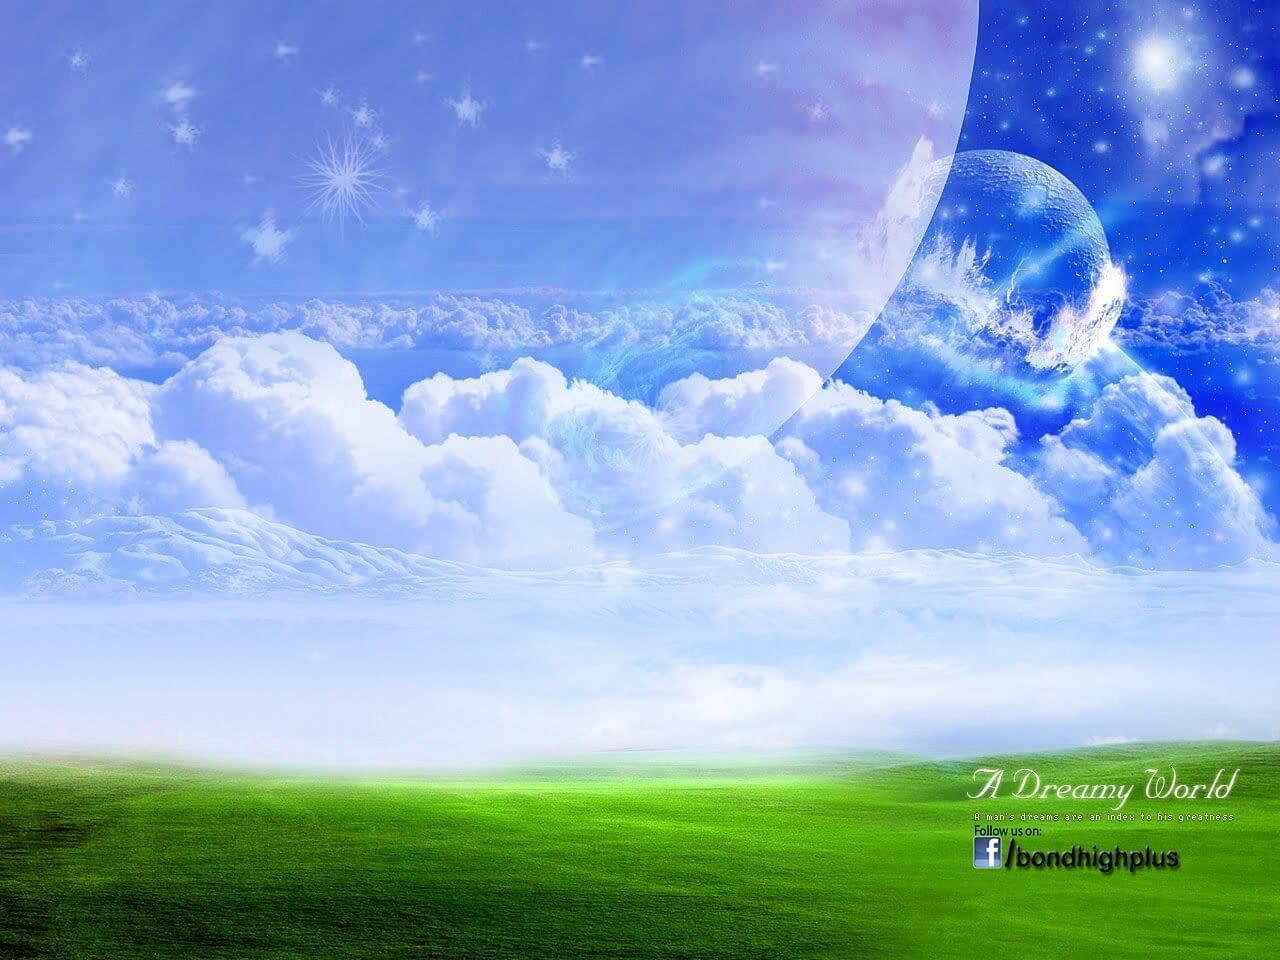 Windows XP High Definition Wallpaper